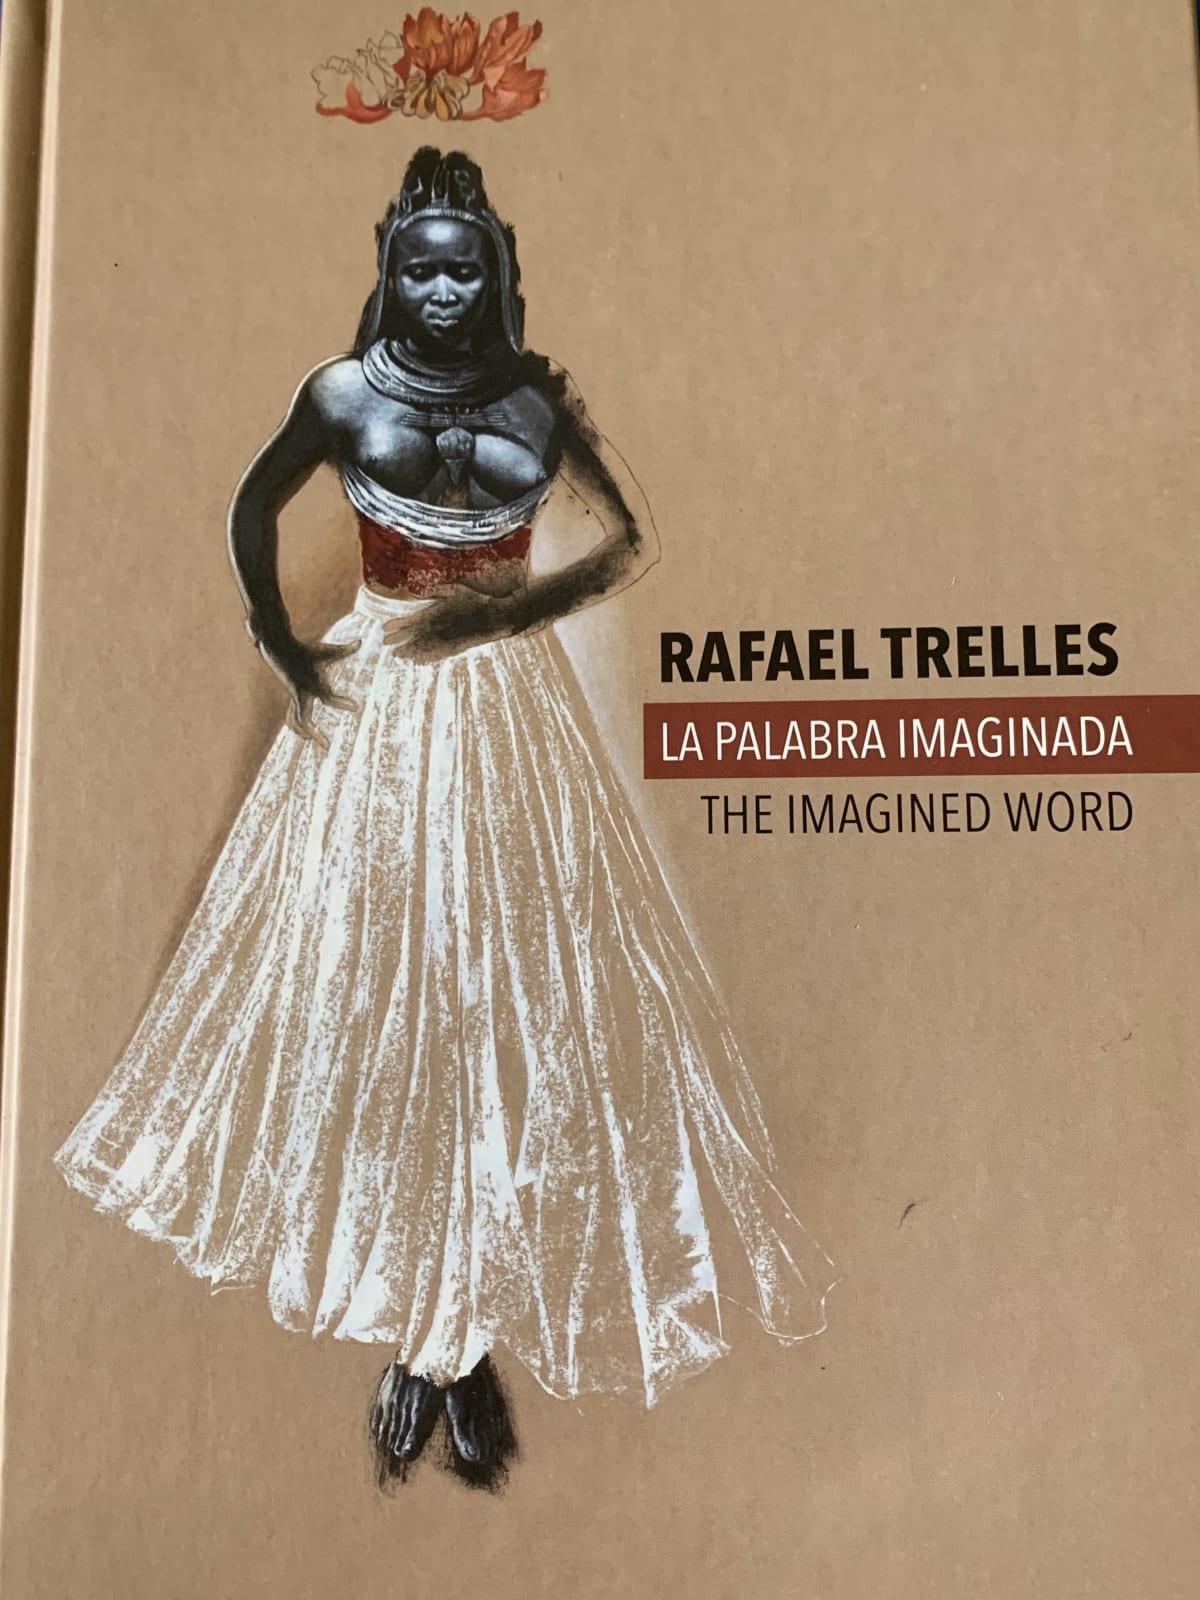 Rafael Trelles, The Imagined Word